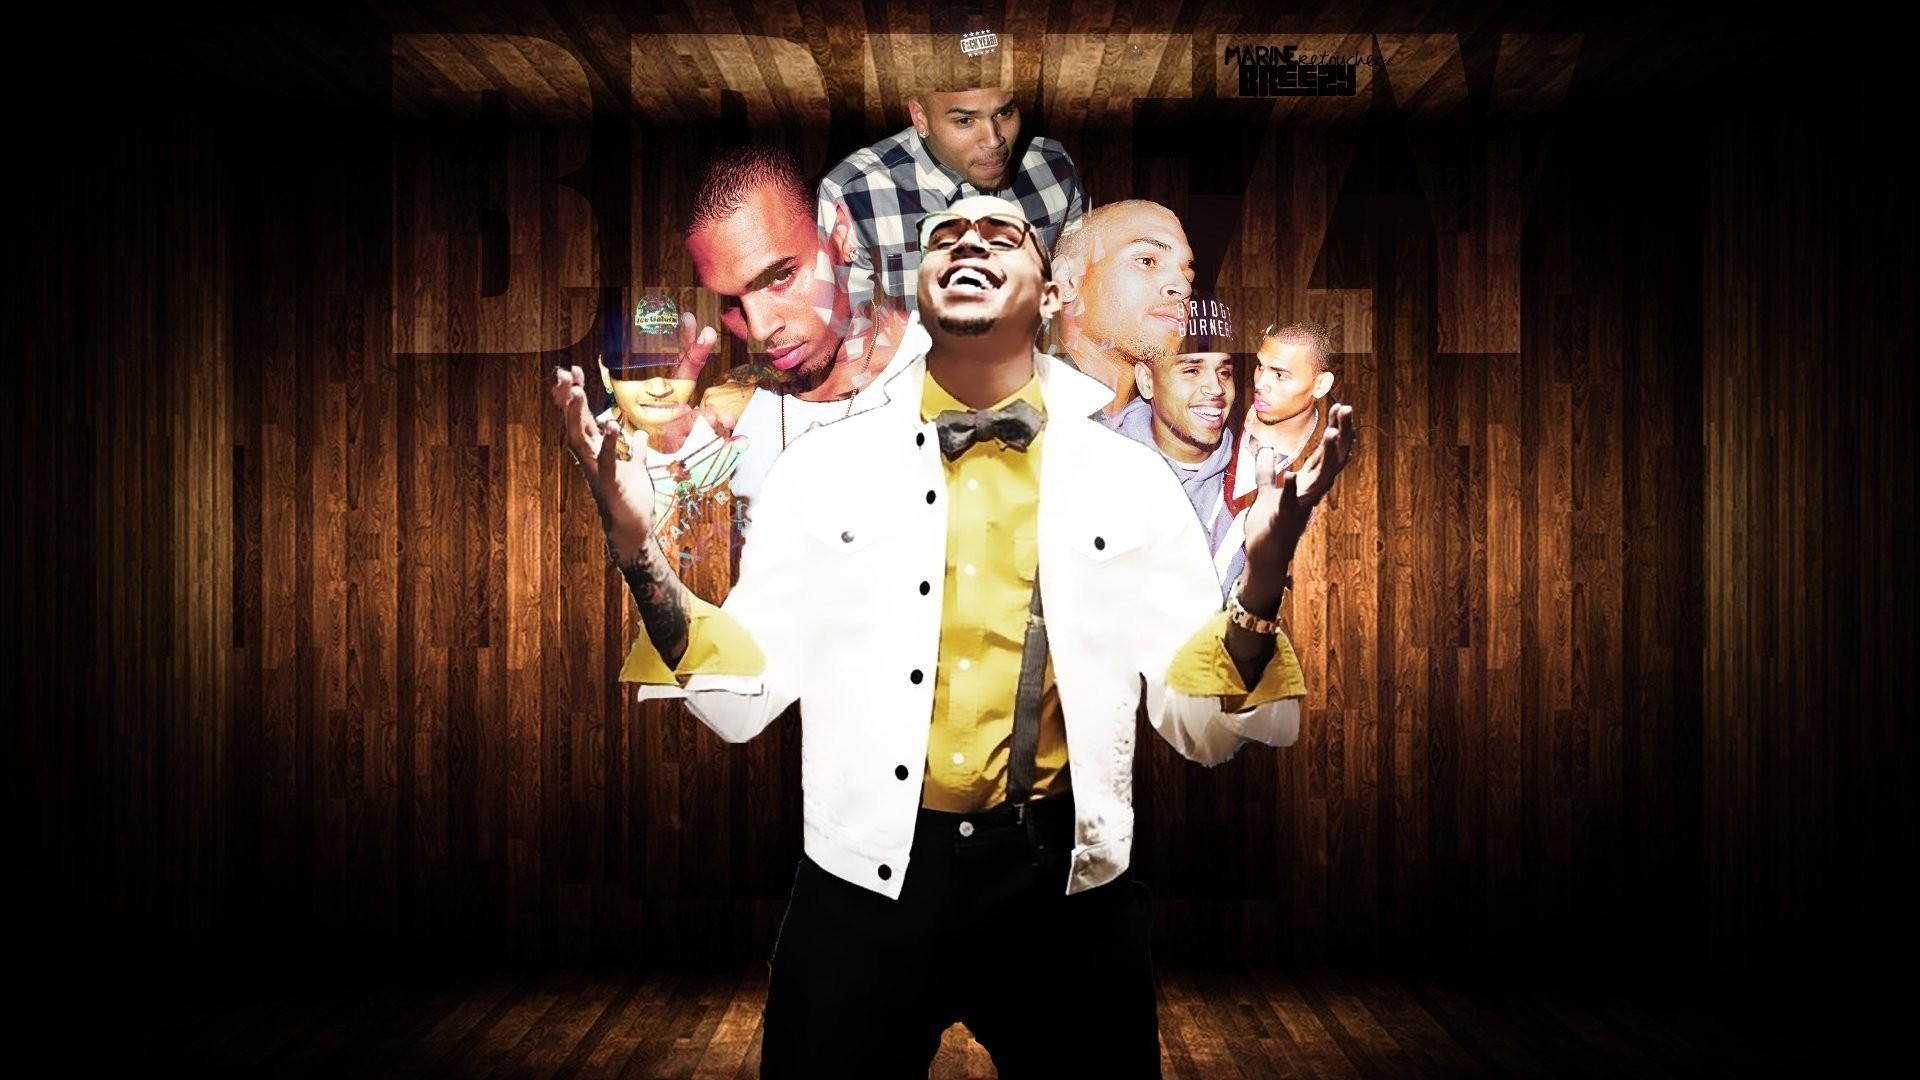 Chris Brown Wallpaper Picture hd